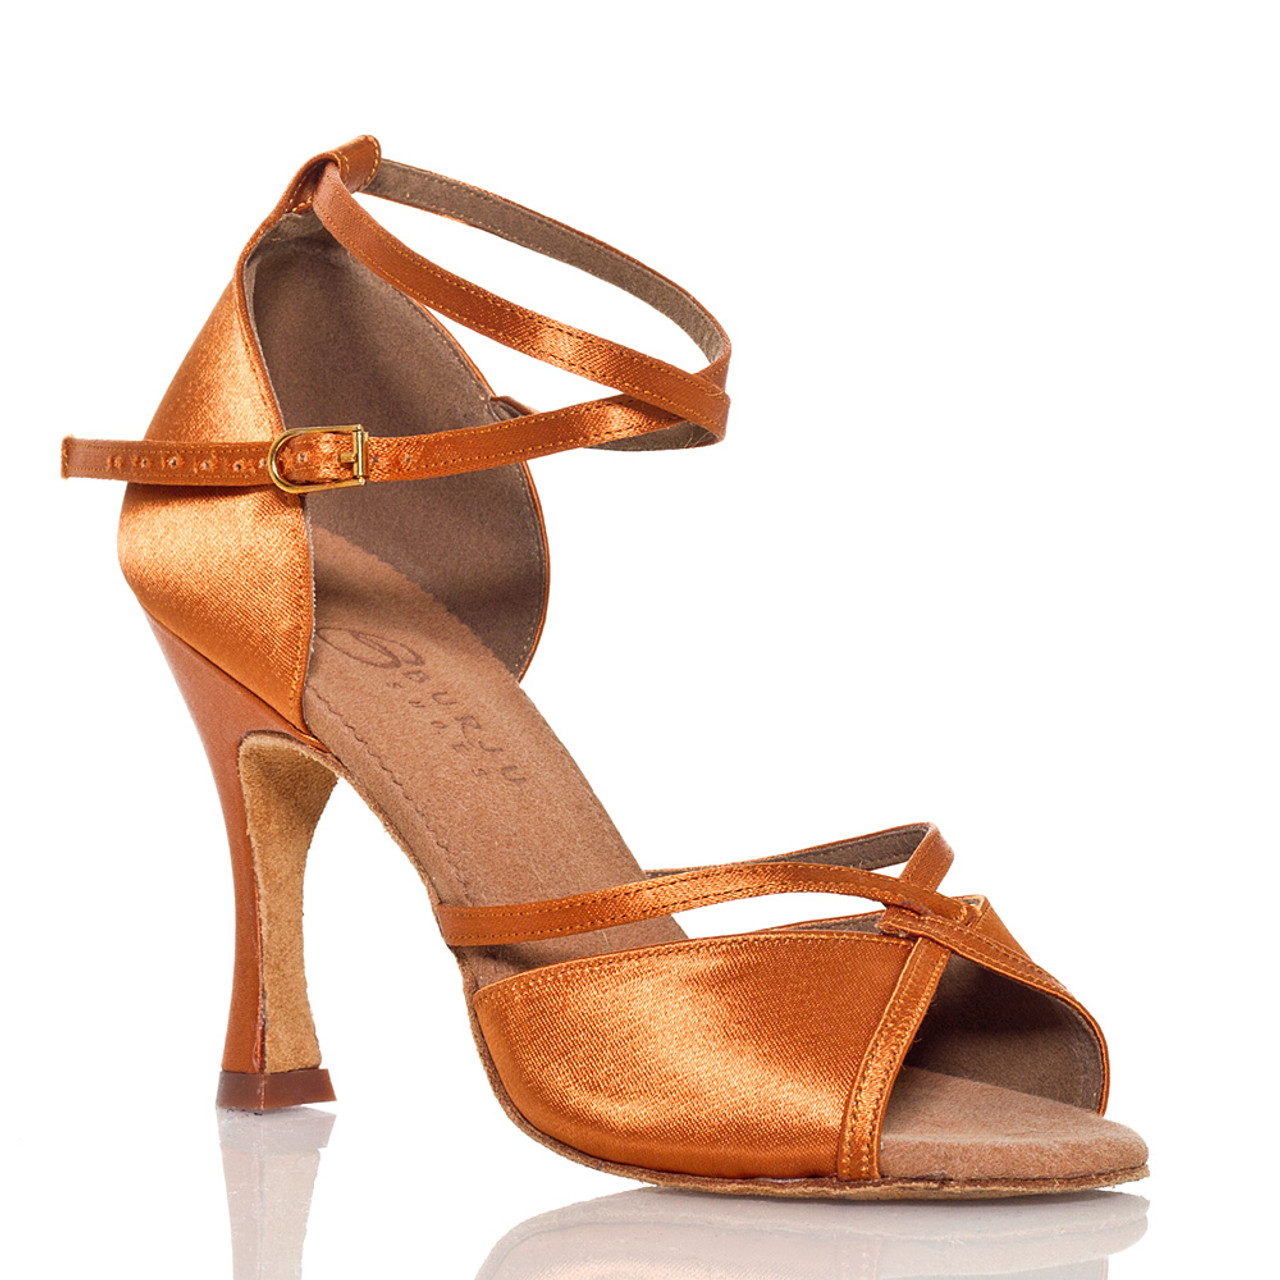 1cac8ba3a8b Linked - Nude Cross strap Dance Shoe - 3.75 inch Flared Heels - Burju Shoes